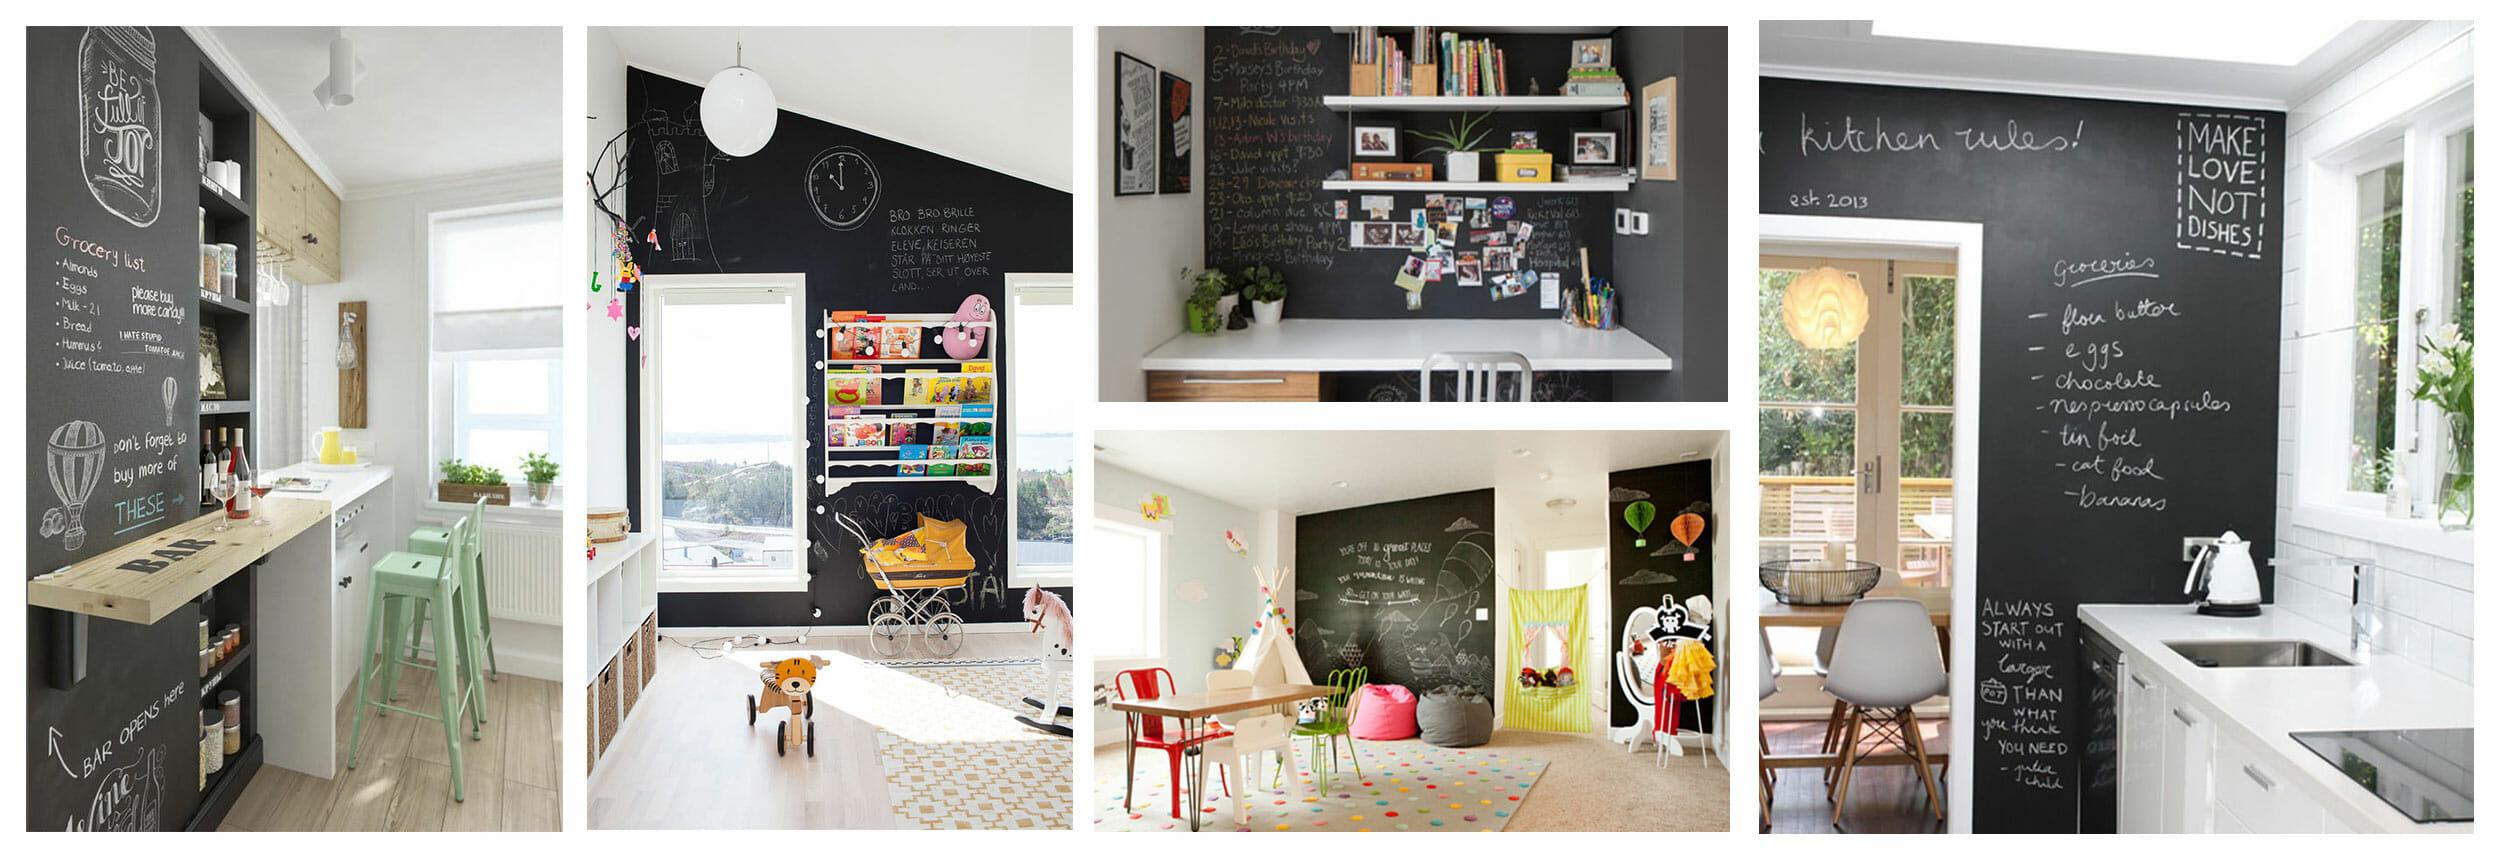 chalkboard-collage